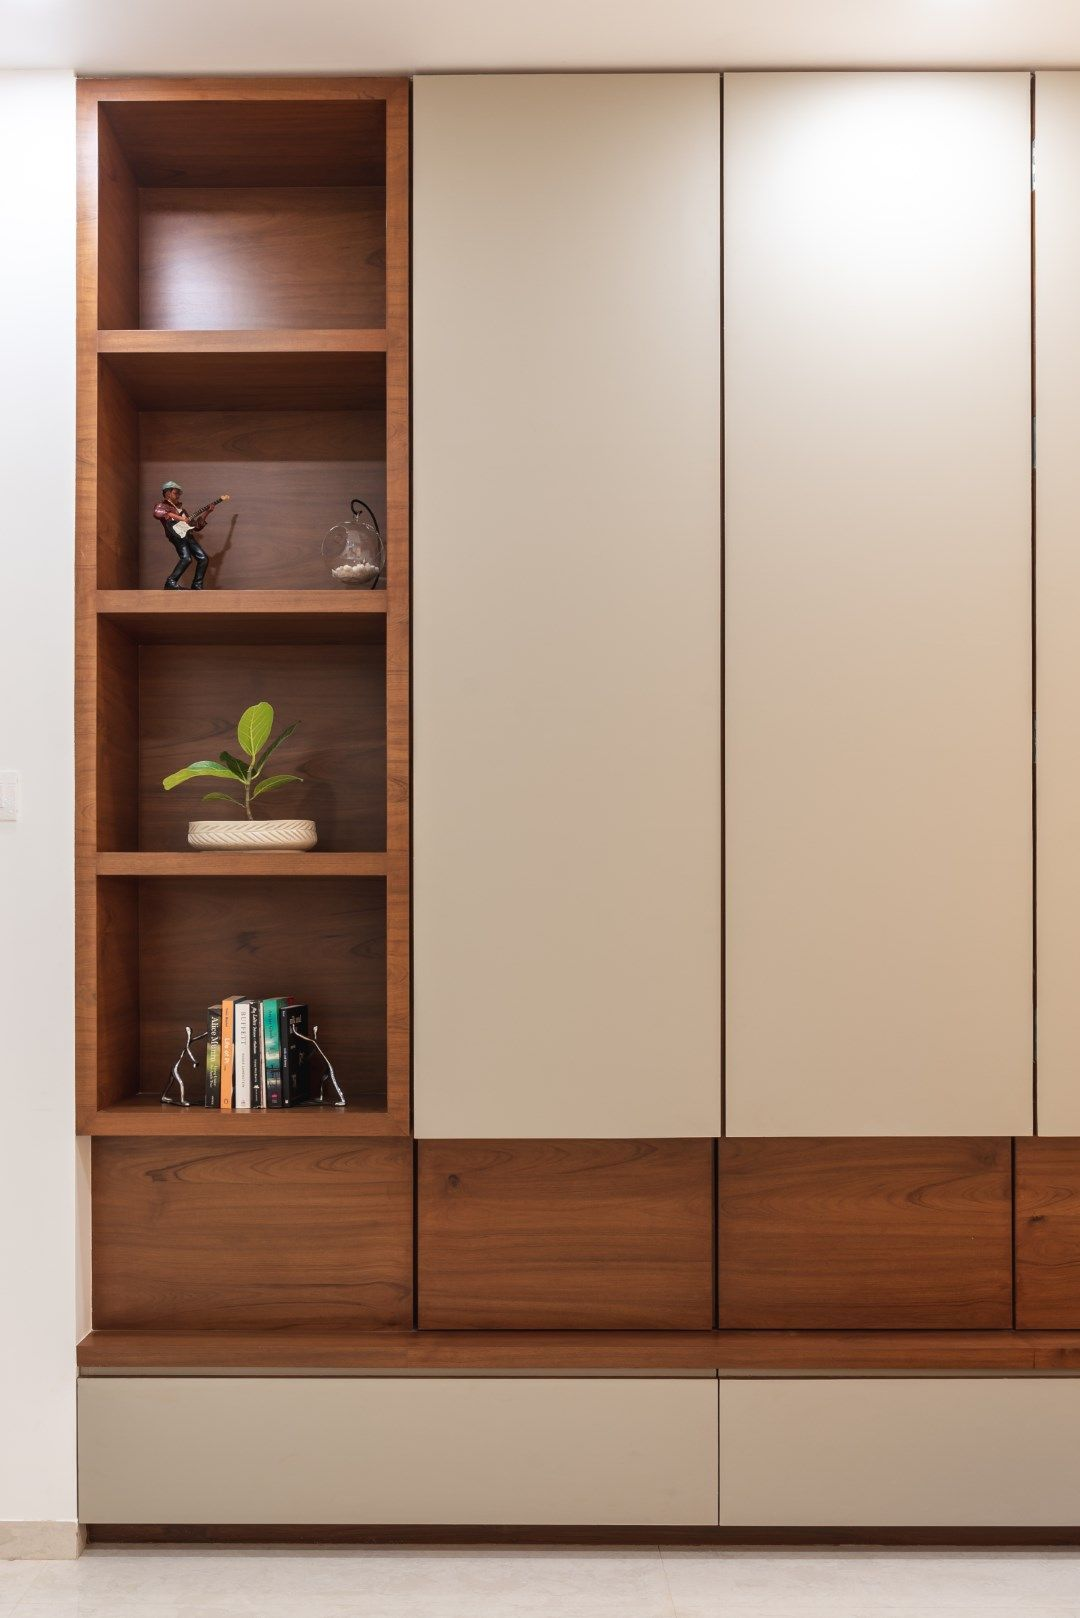 Swaram A Contemporary House Wardrobe design House Furniture